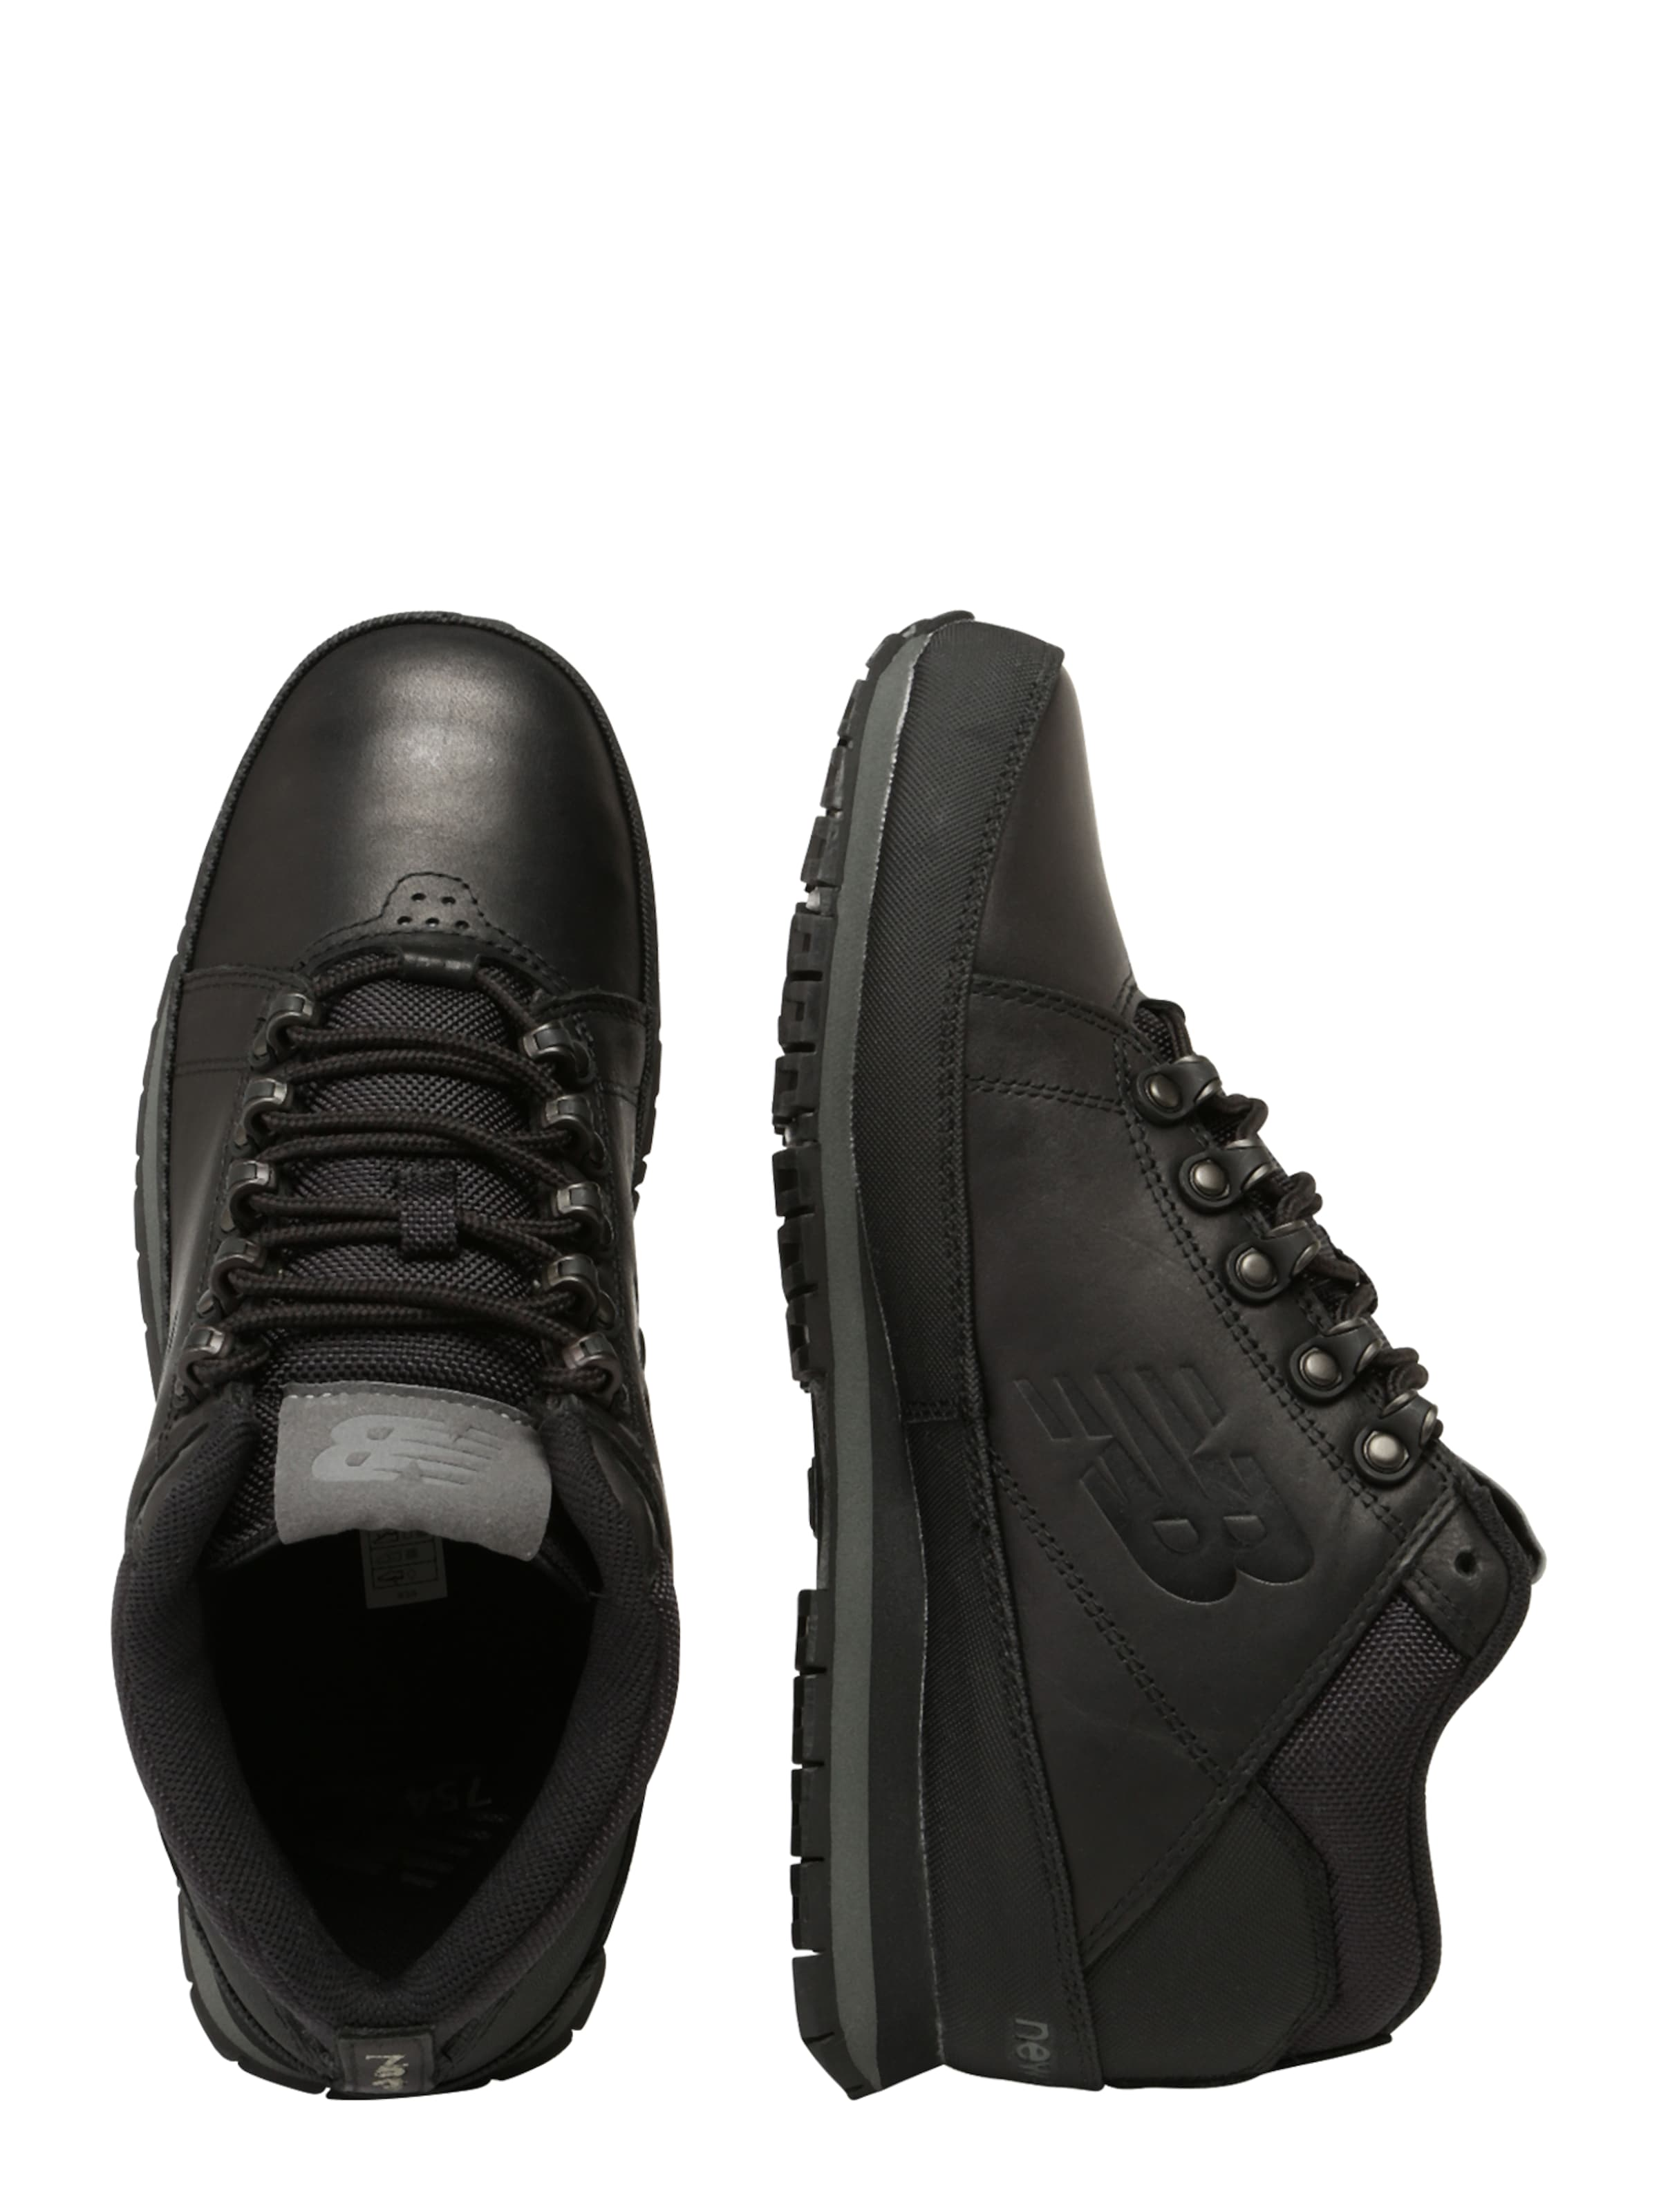 In In New New Sneaker Balance Balance Sneaker Schwarz Schwarz Tl1uKFJc3